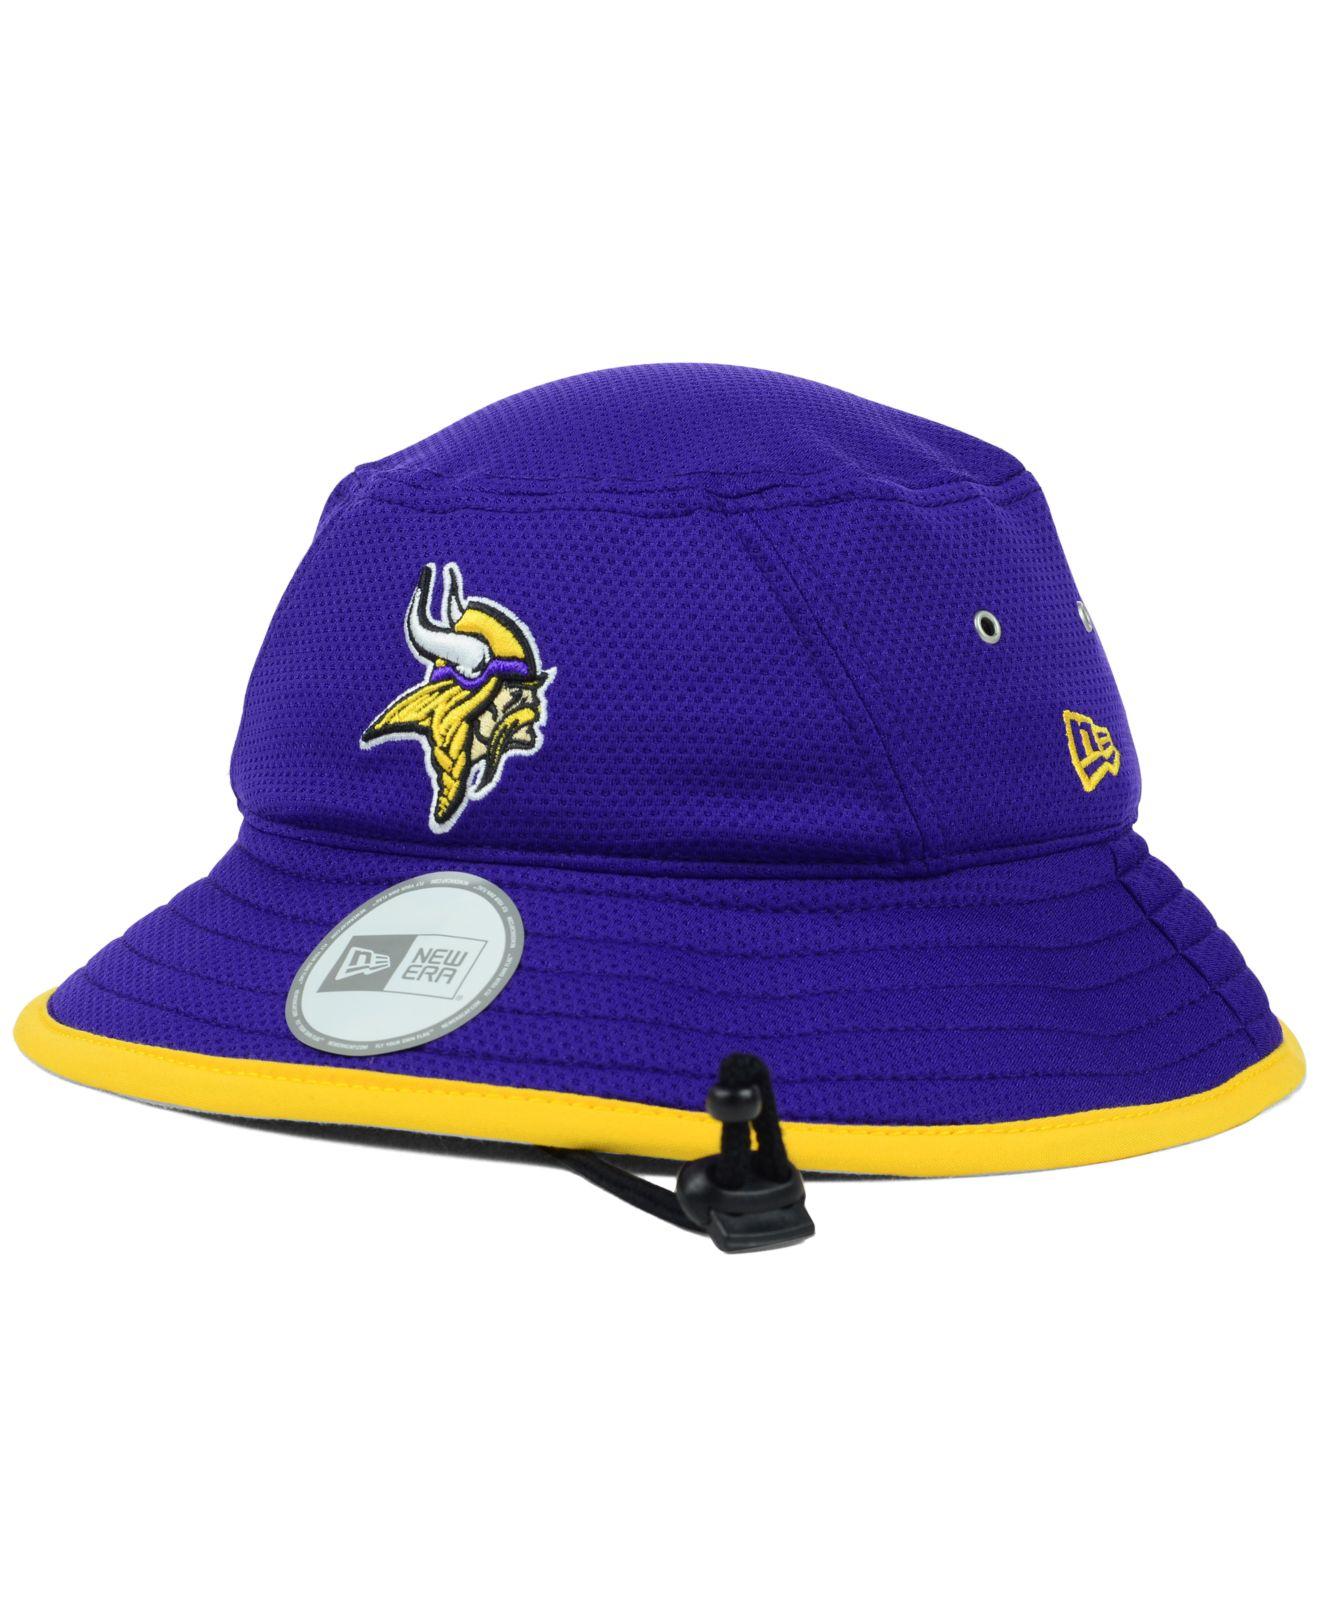 7605f058307 Lyst - KTZ Minnesota Vikings Tc Training Bucket Hat in Purple for Men